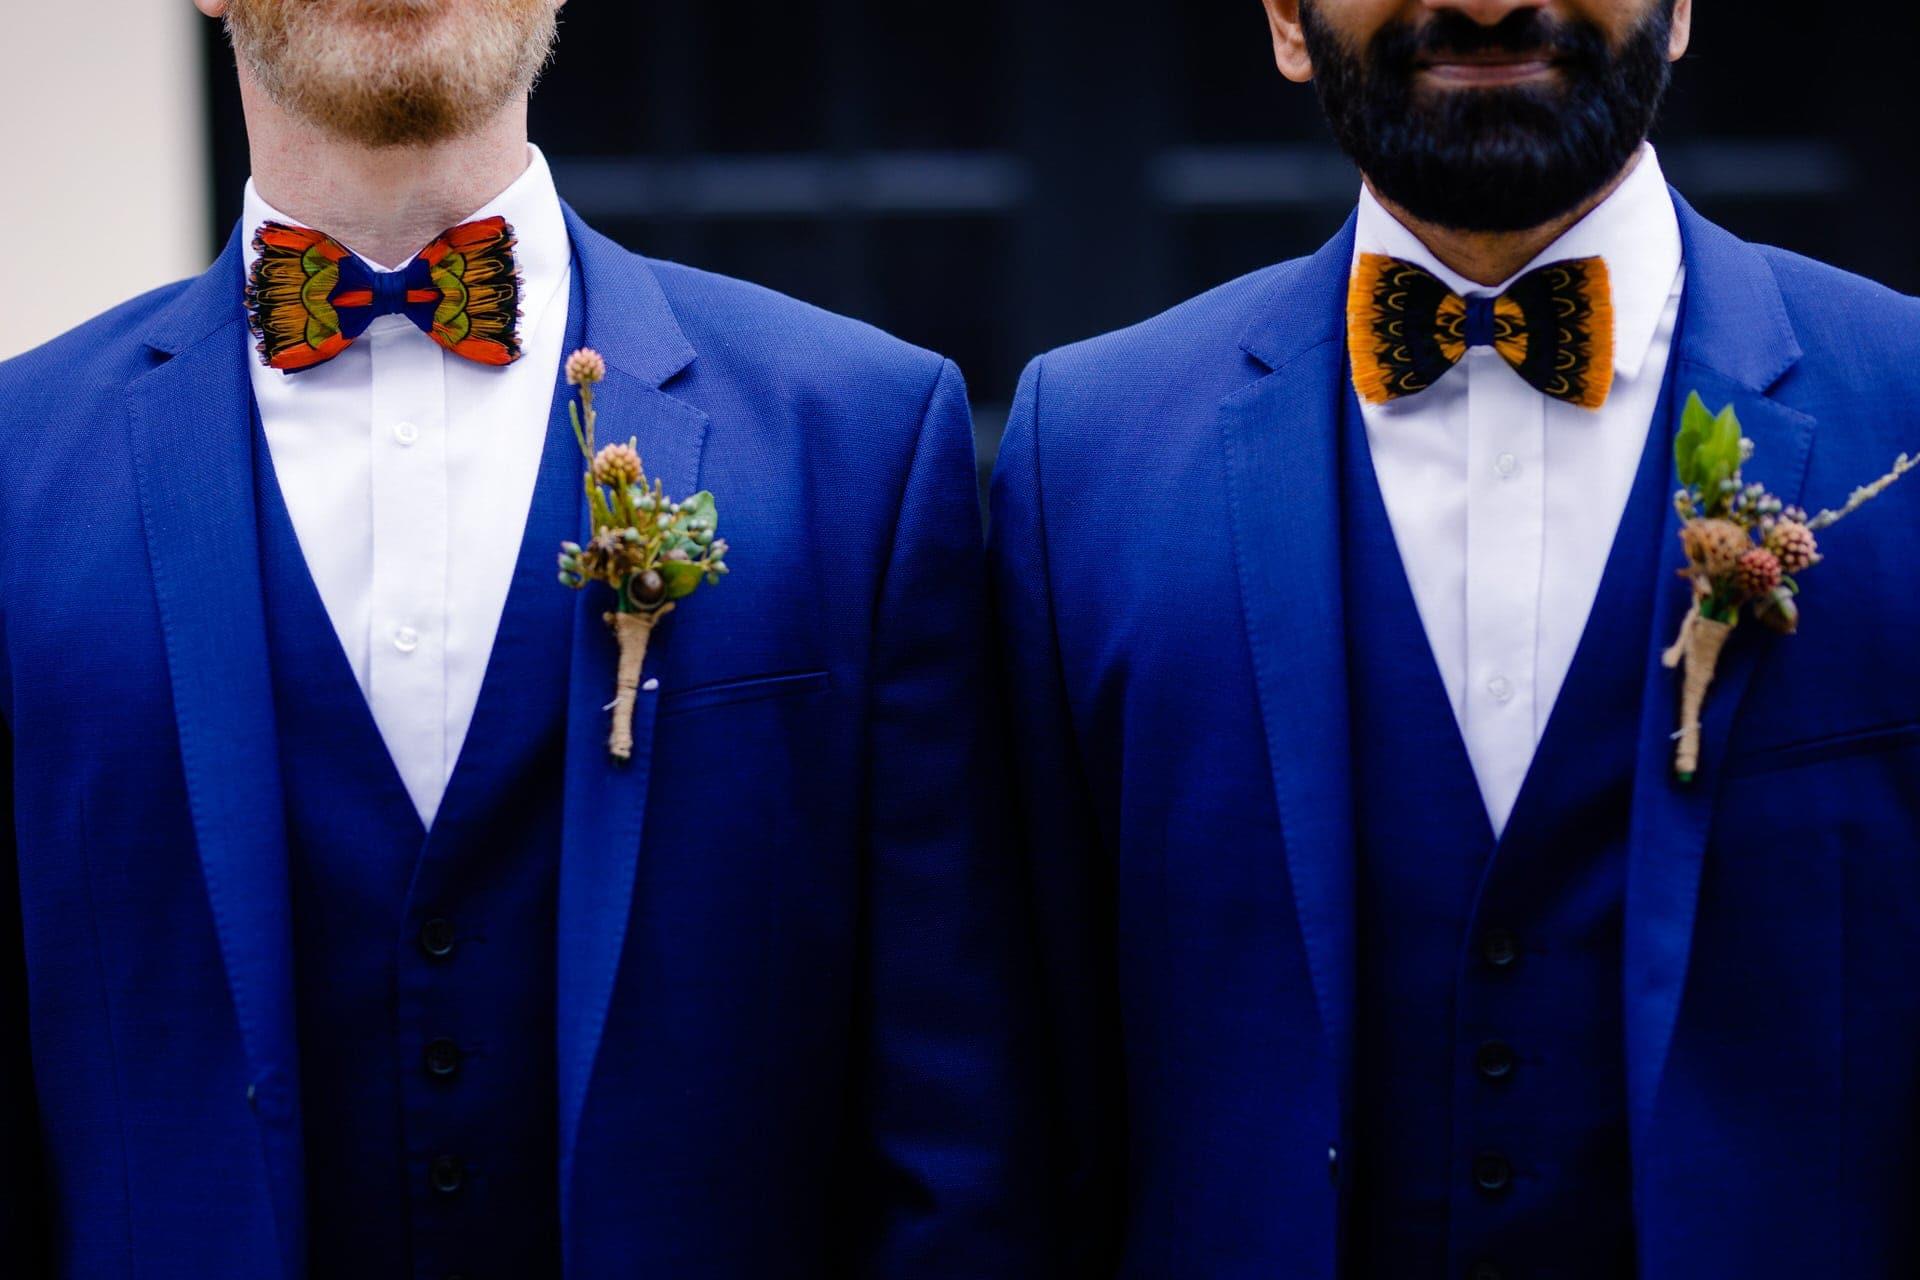 two grooms wearing bow-ties